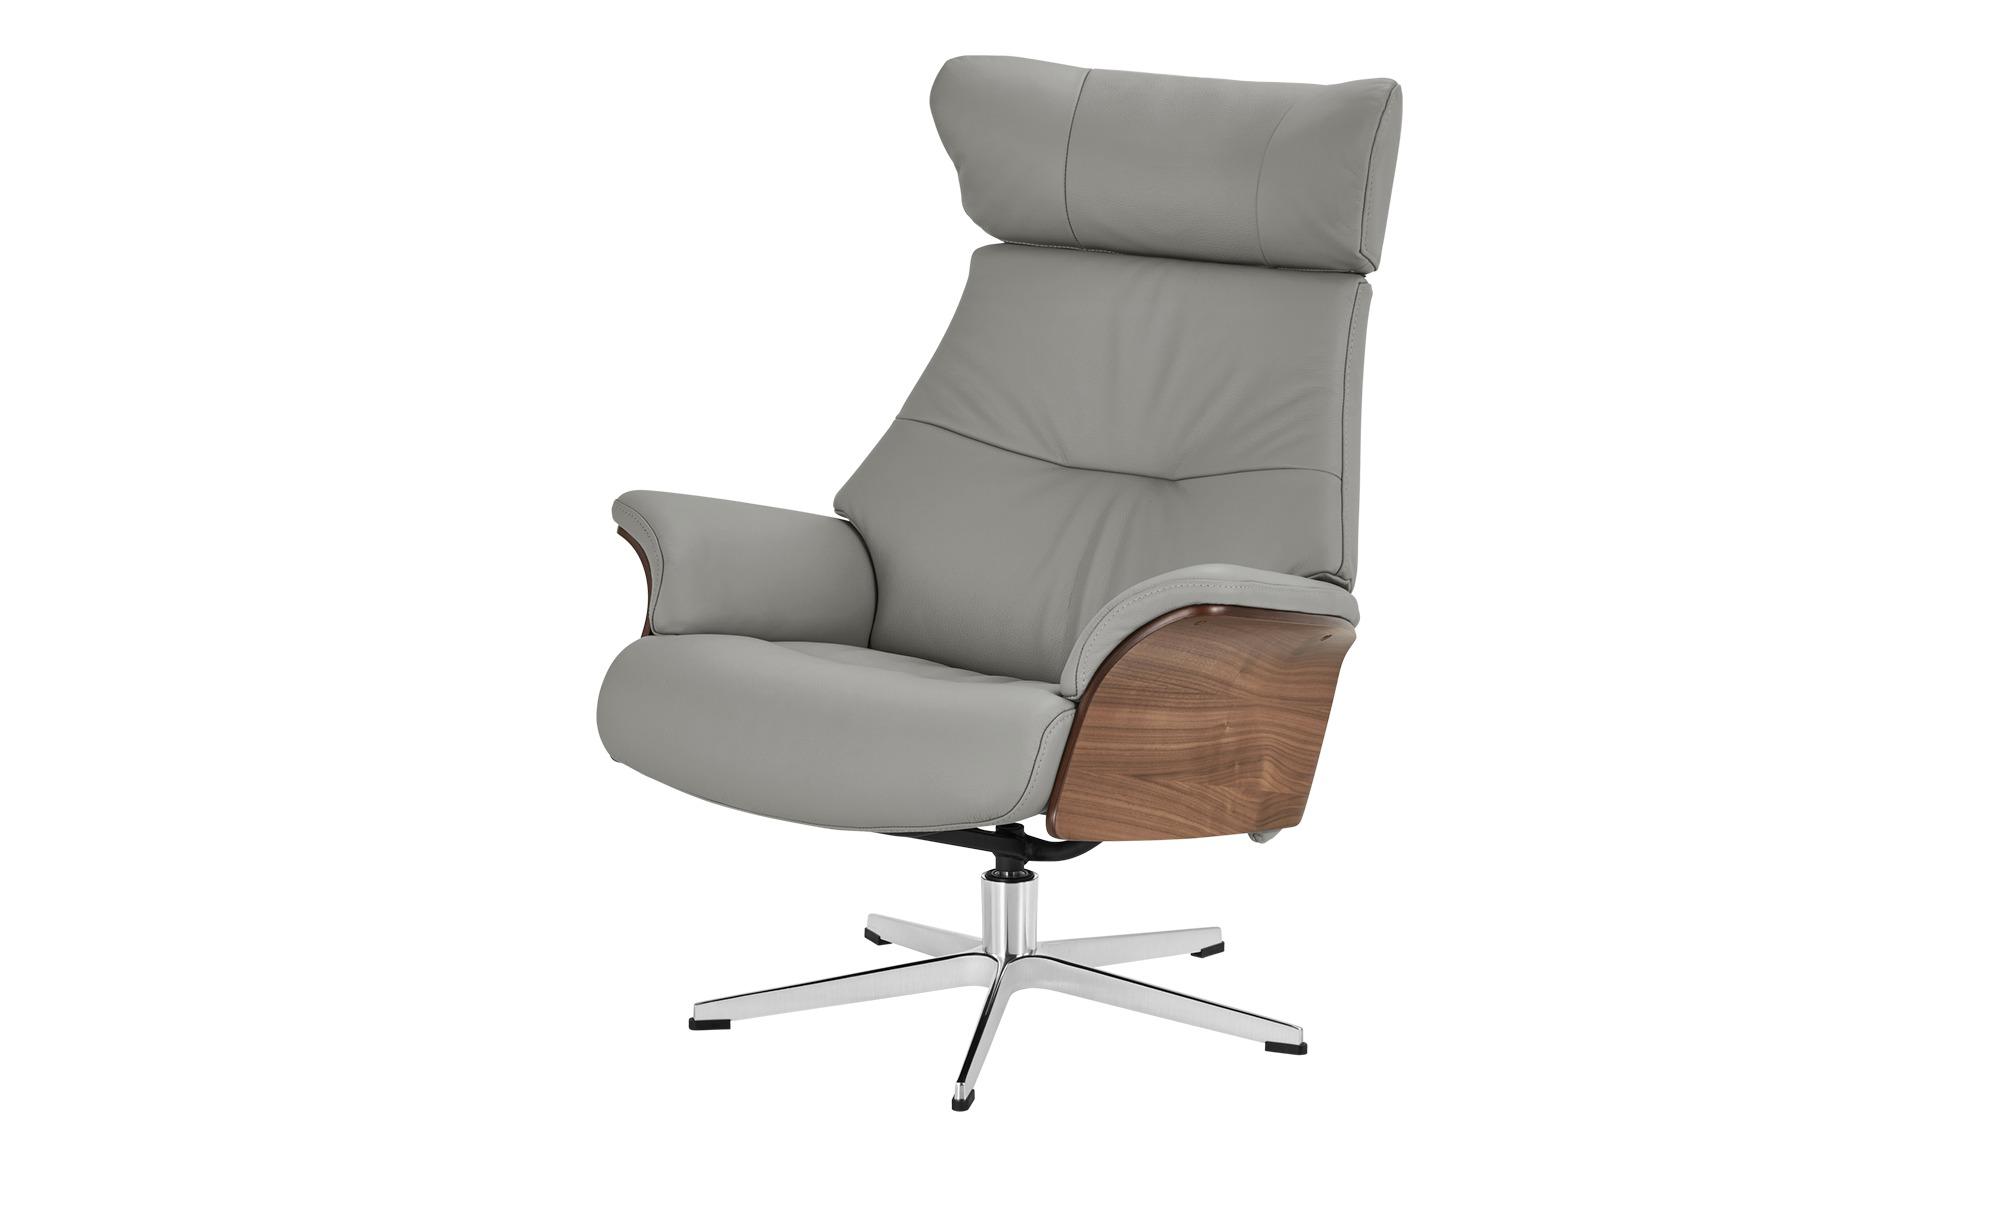 Relaxsessel Air Grau Sitzhohe 43 Cm Mobel Hoffner